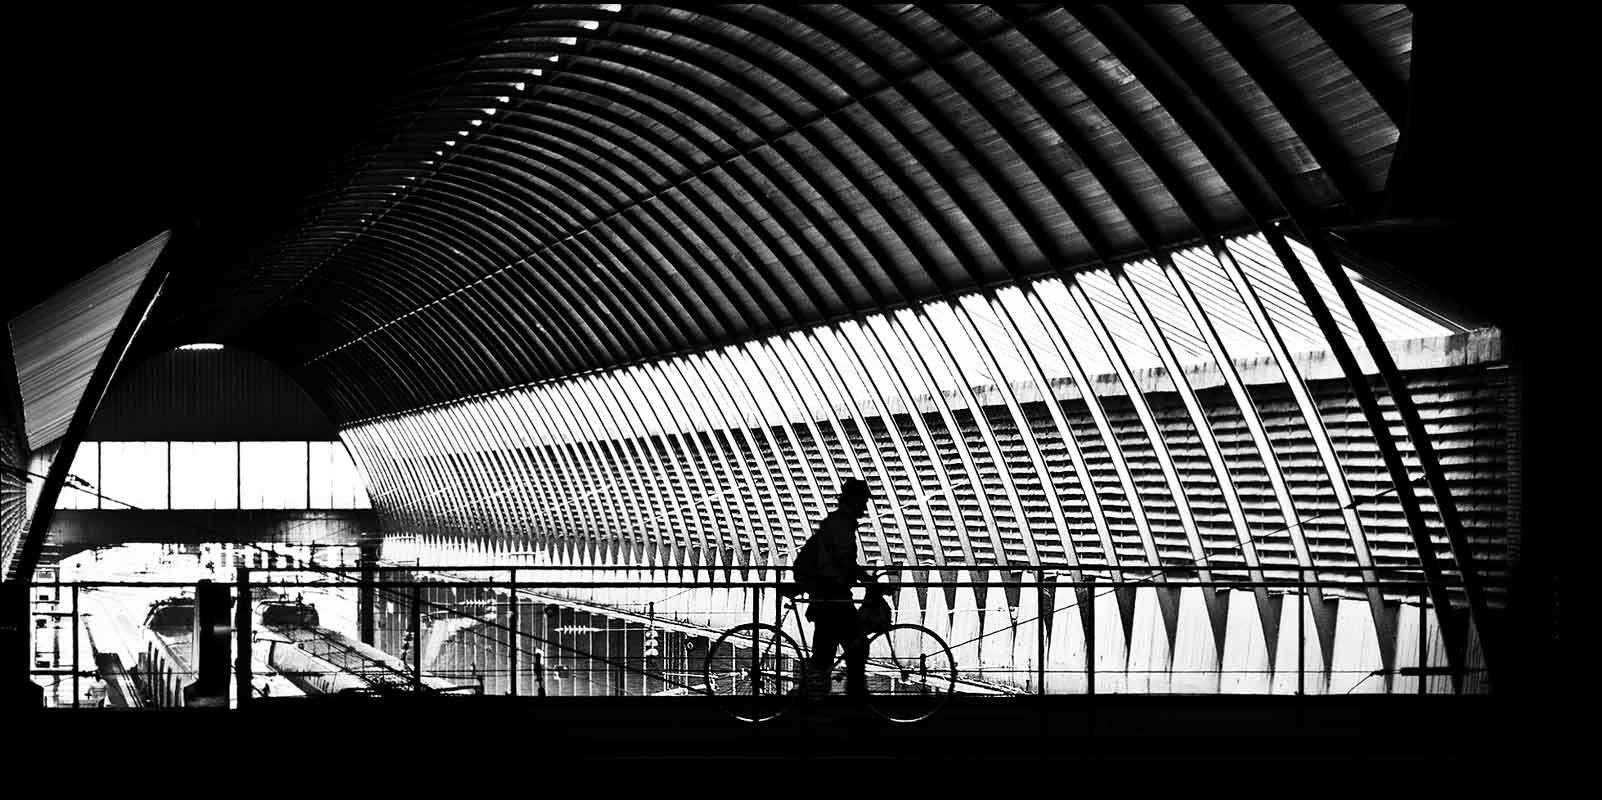 veronica_perez_granado_photography_periodista_fotografa_RENGLONES_urban_Street_a